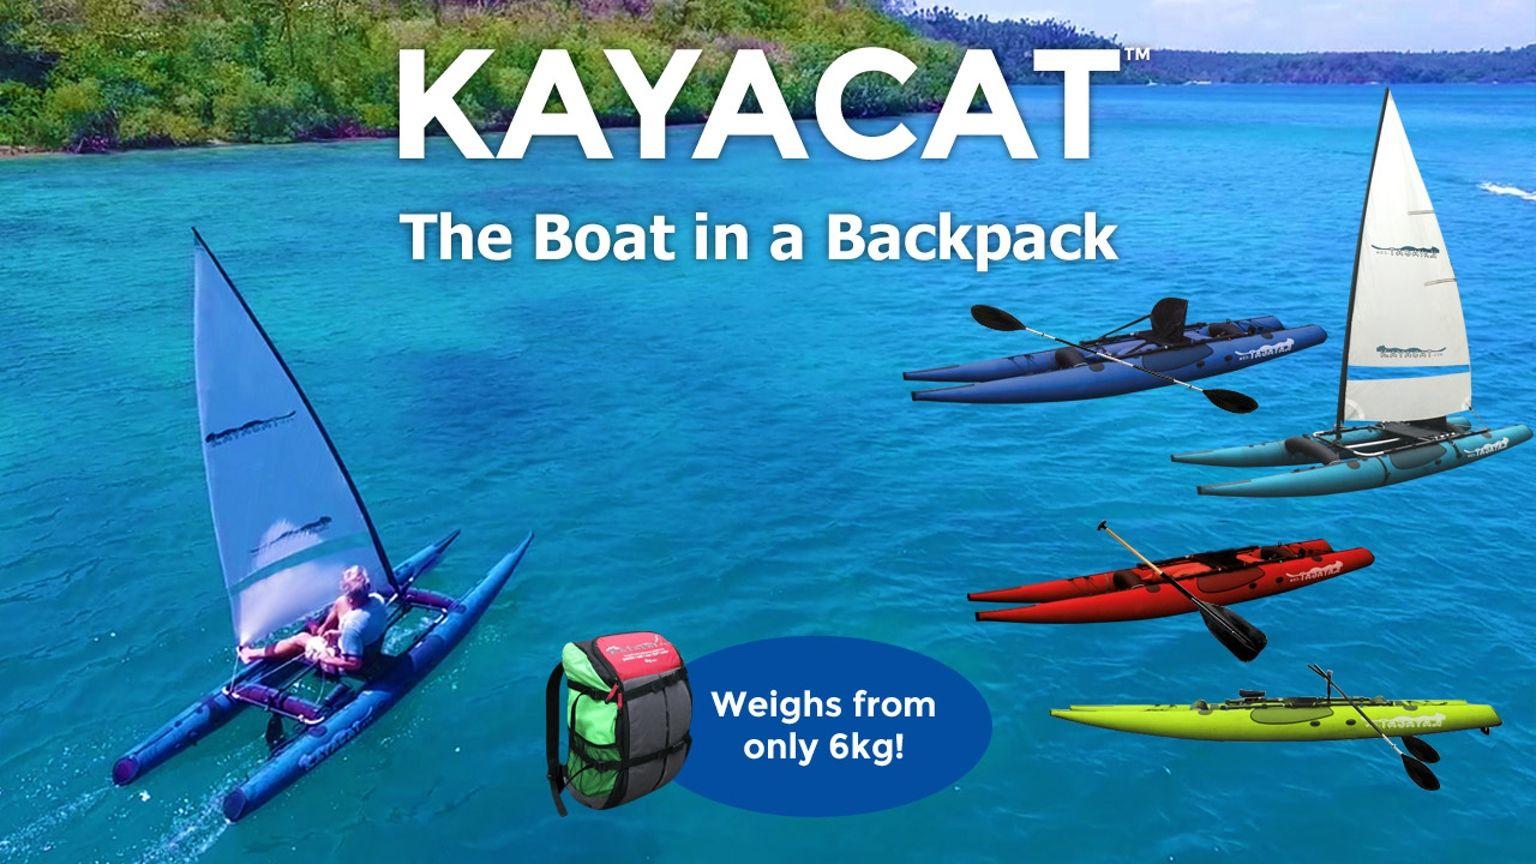 Kayak Sail Sup Row Motor Kayacat The Lightest Most Versatile Multi Mode Compact Personal Watercraft In The World